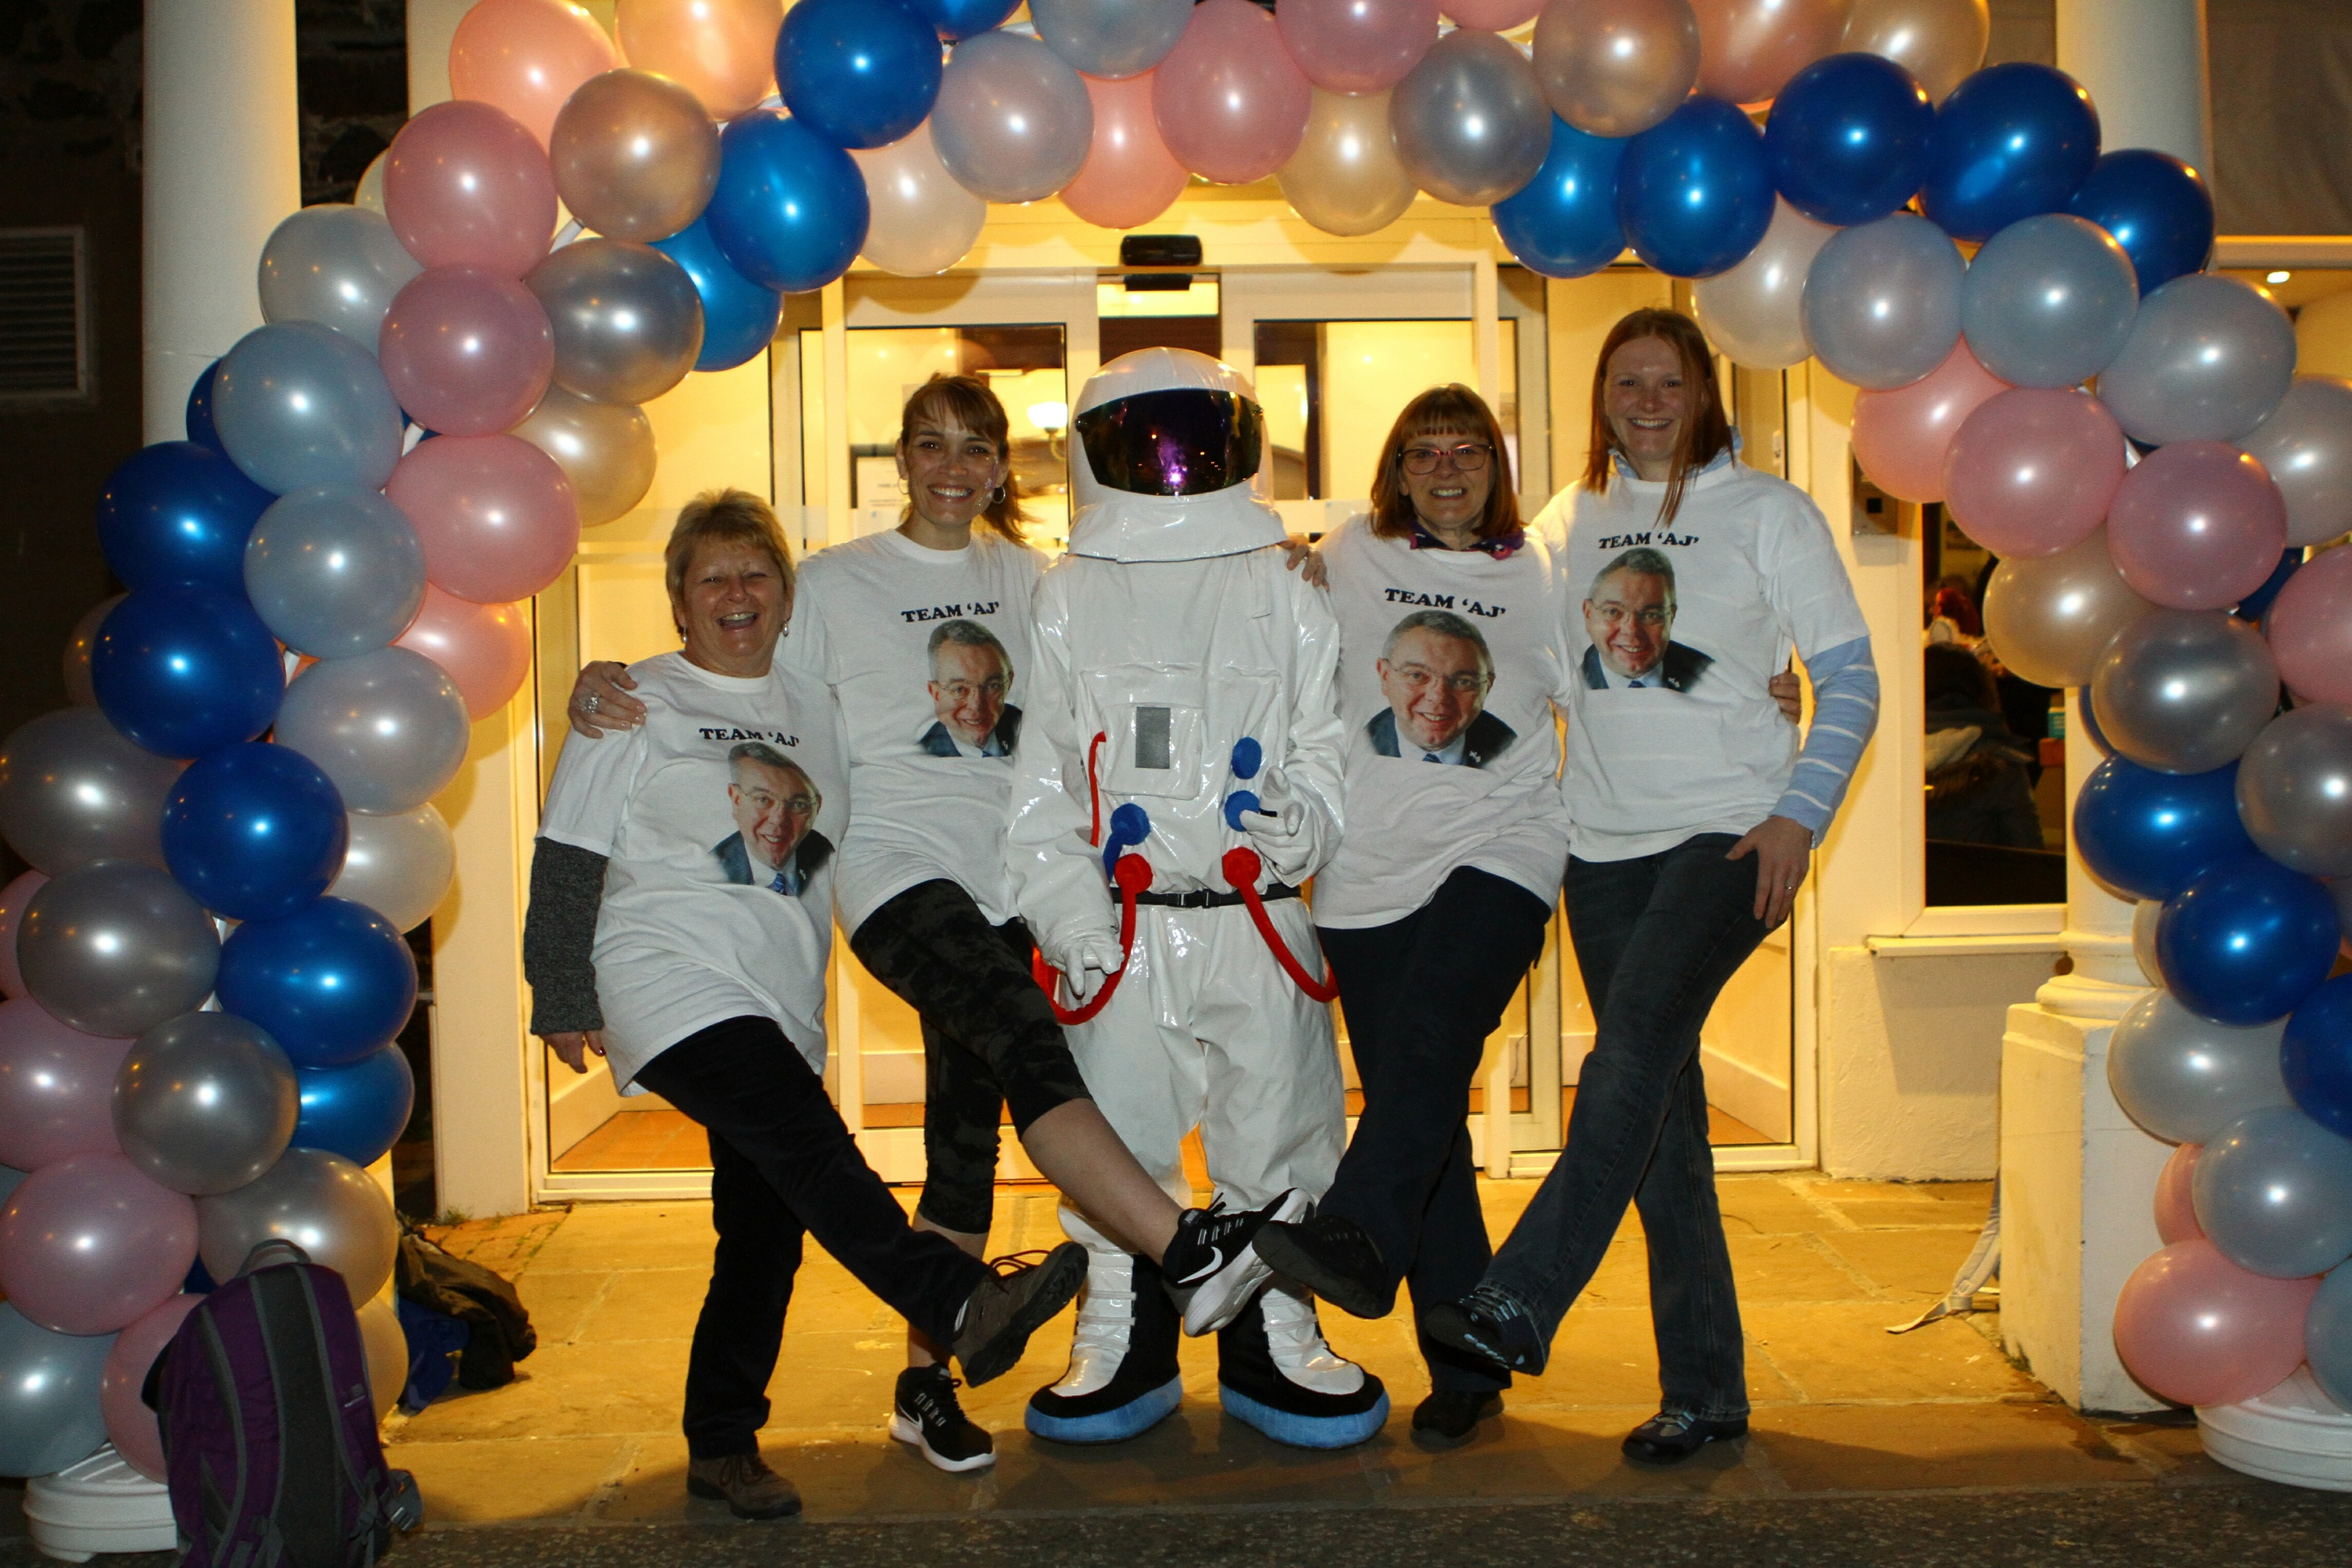 Team AJ from left — Shirley Burnett, Karen Anderson, spaceman Jamie Docherty, Linda Johnstone, and her daughter Christine Watson.